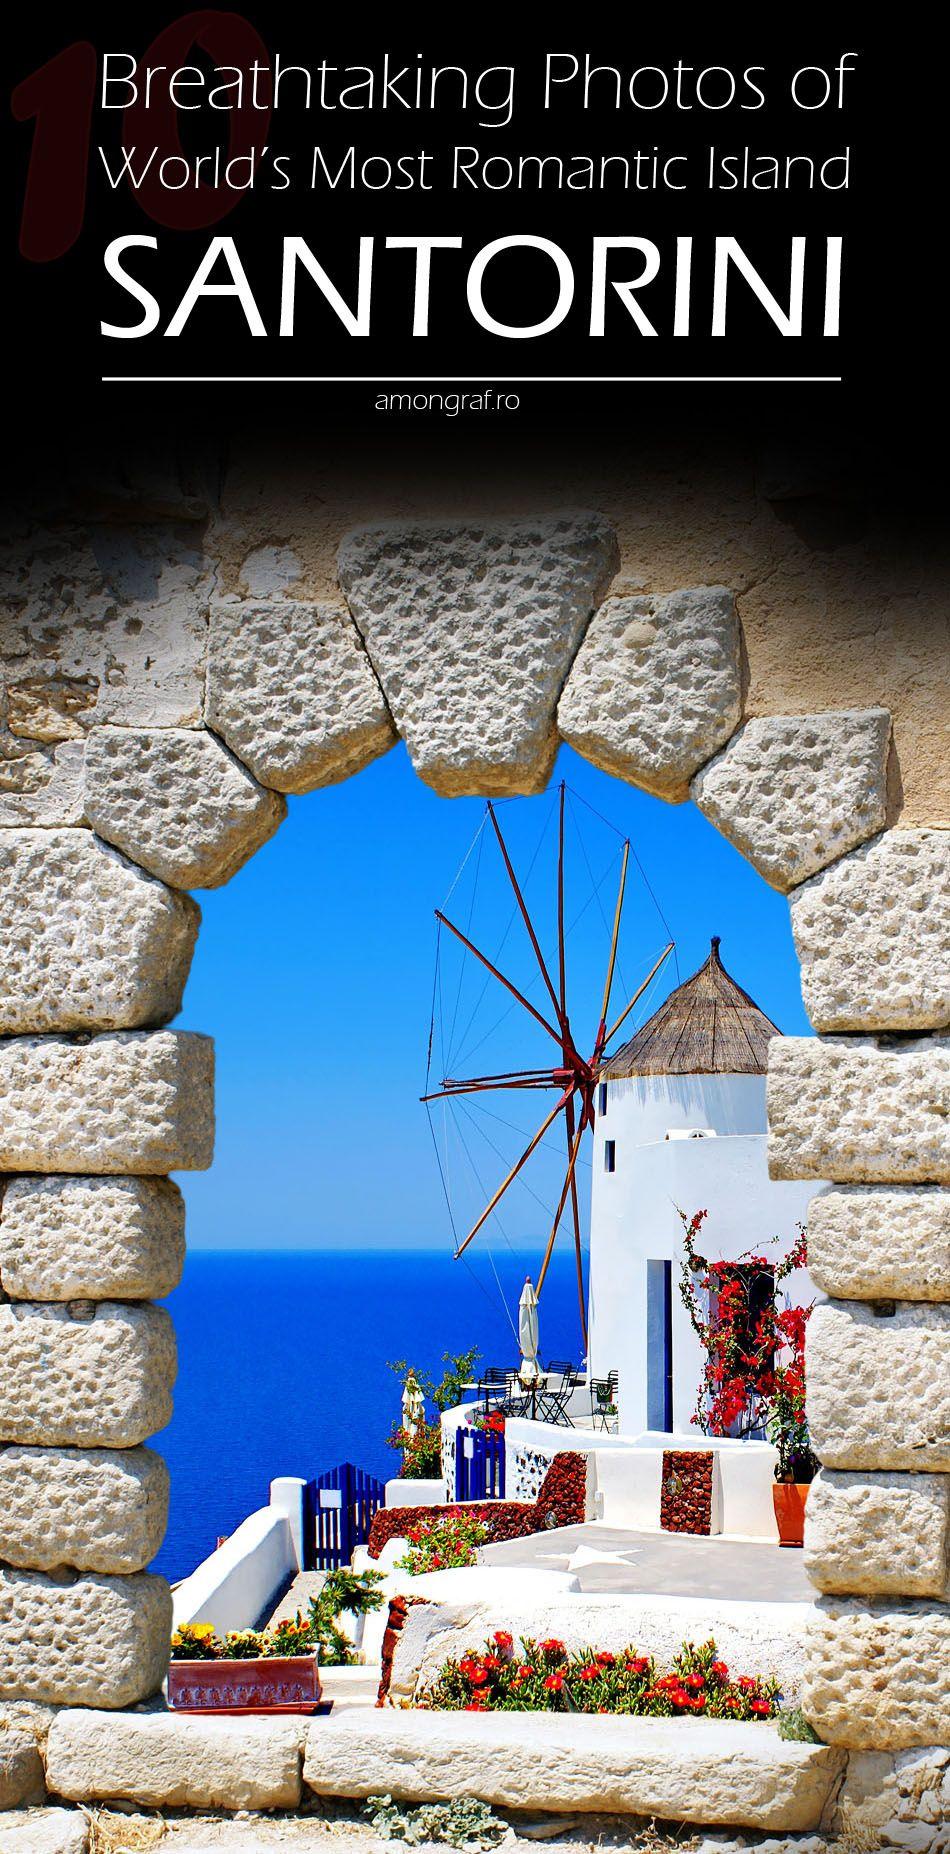 10 Breathtaking Photos of World's Most Romantic Island #Santorini #Greece